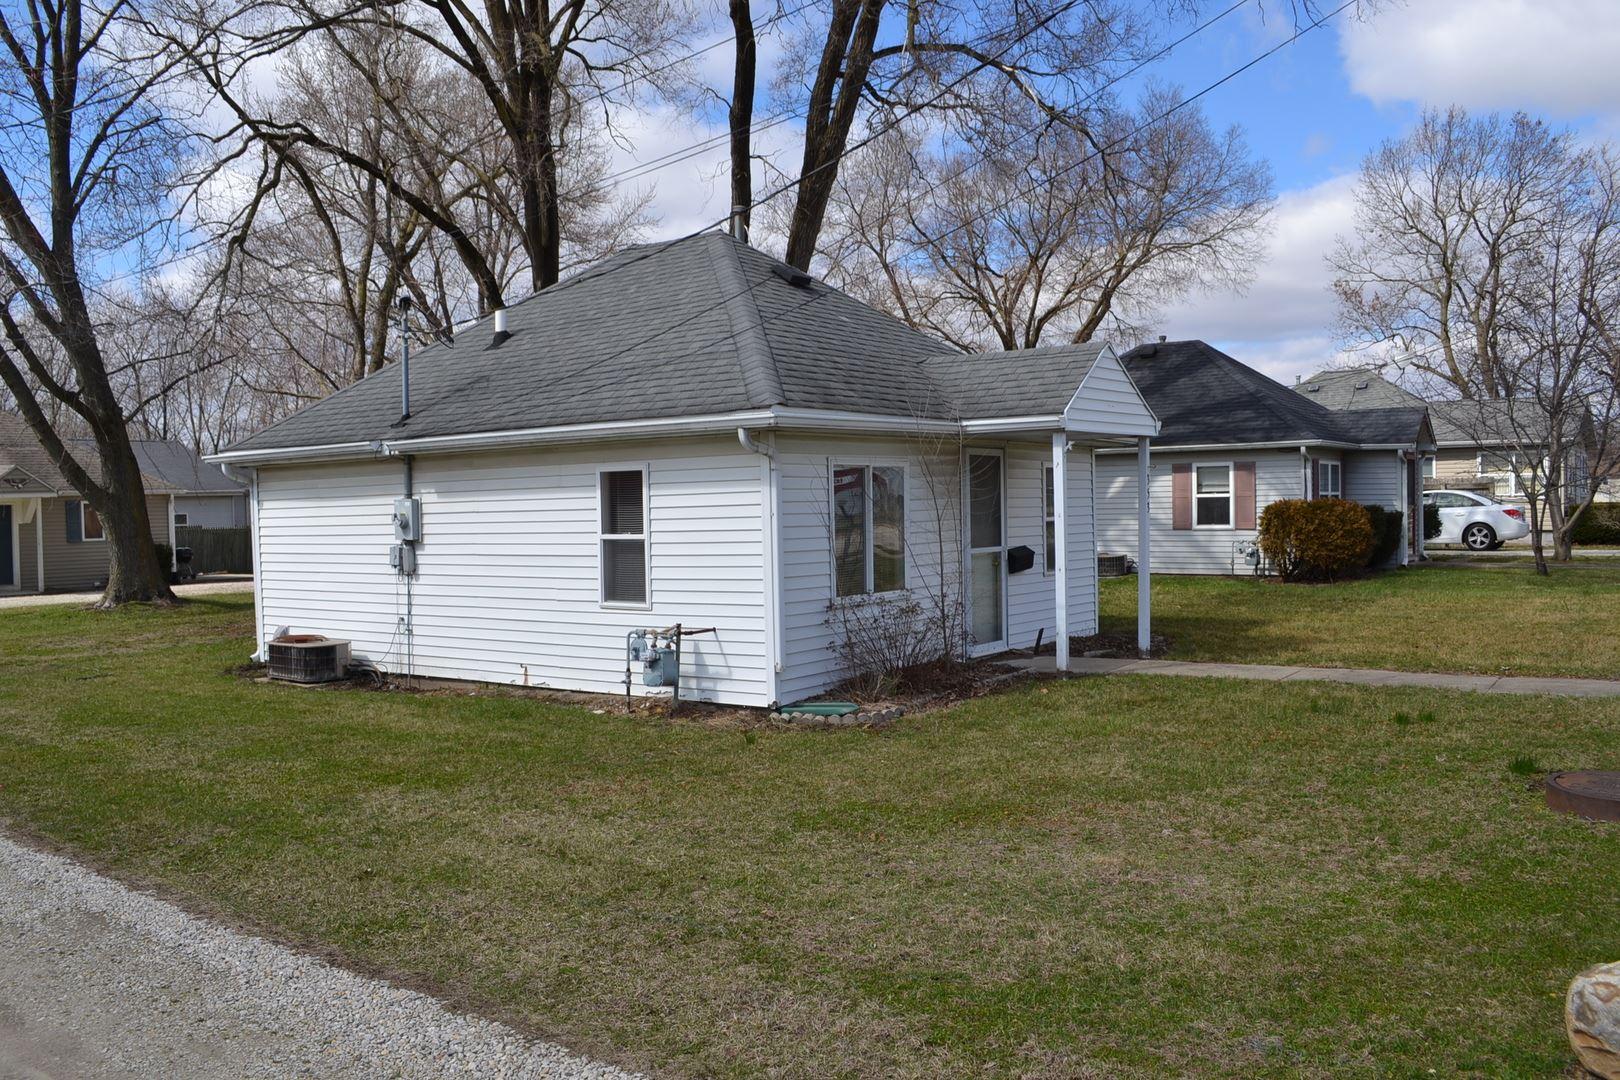 353 S Main Street, Seneca, IL 61360 - #: 10685039